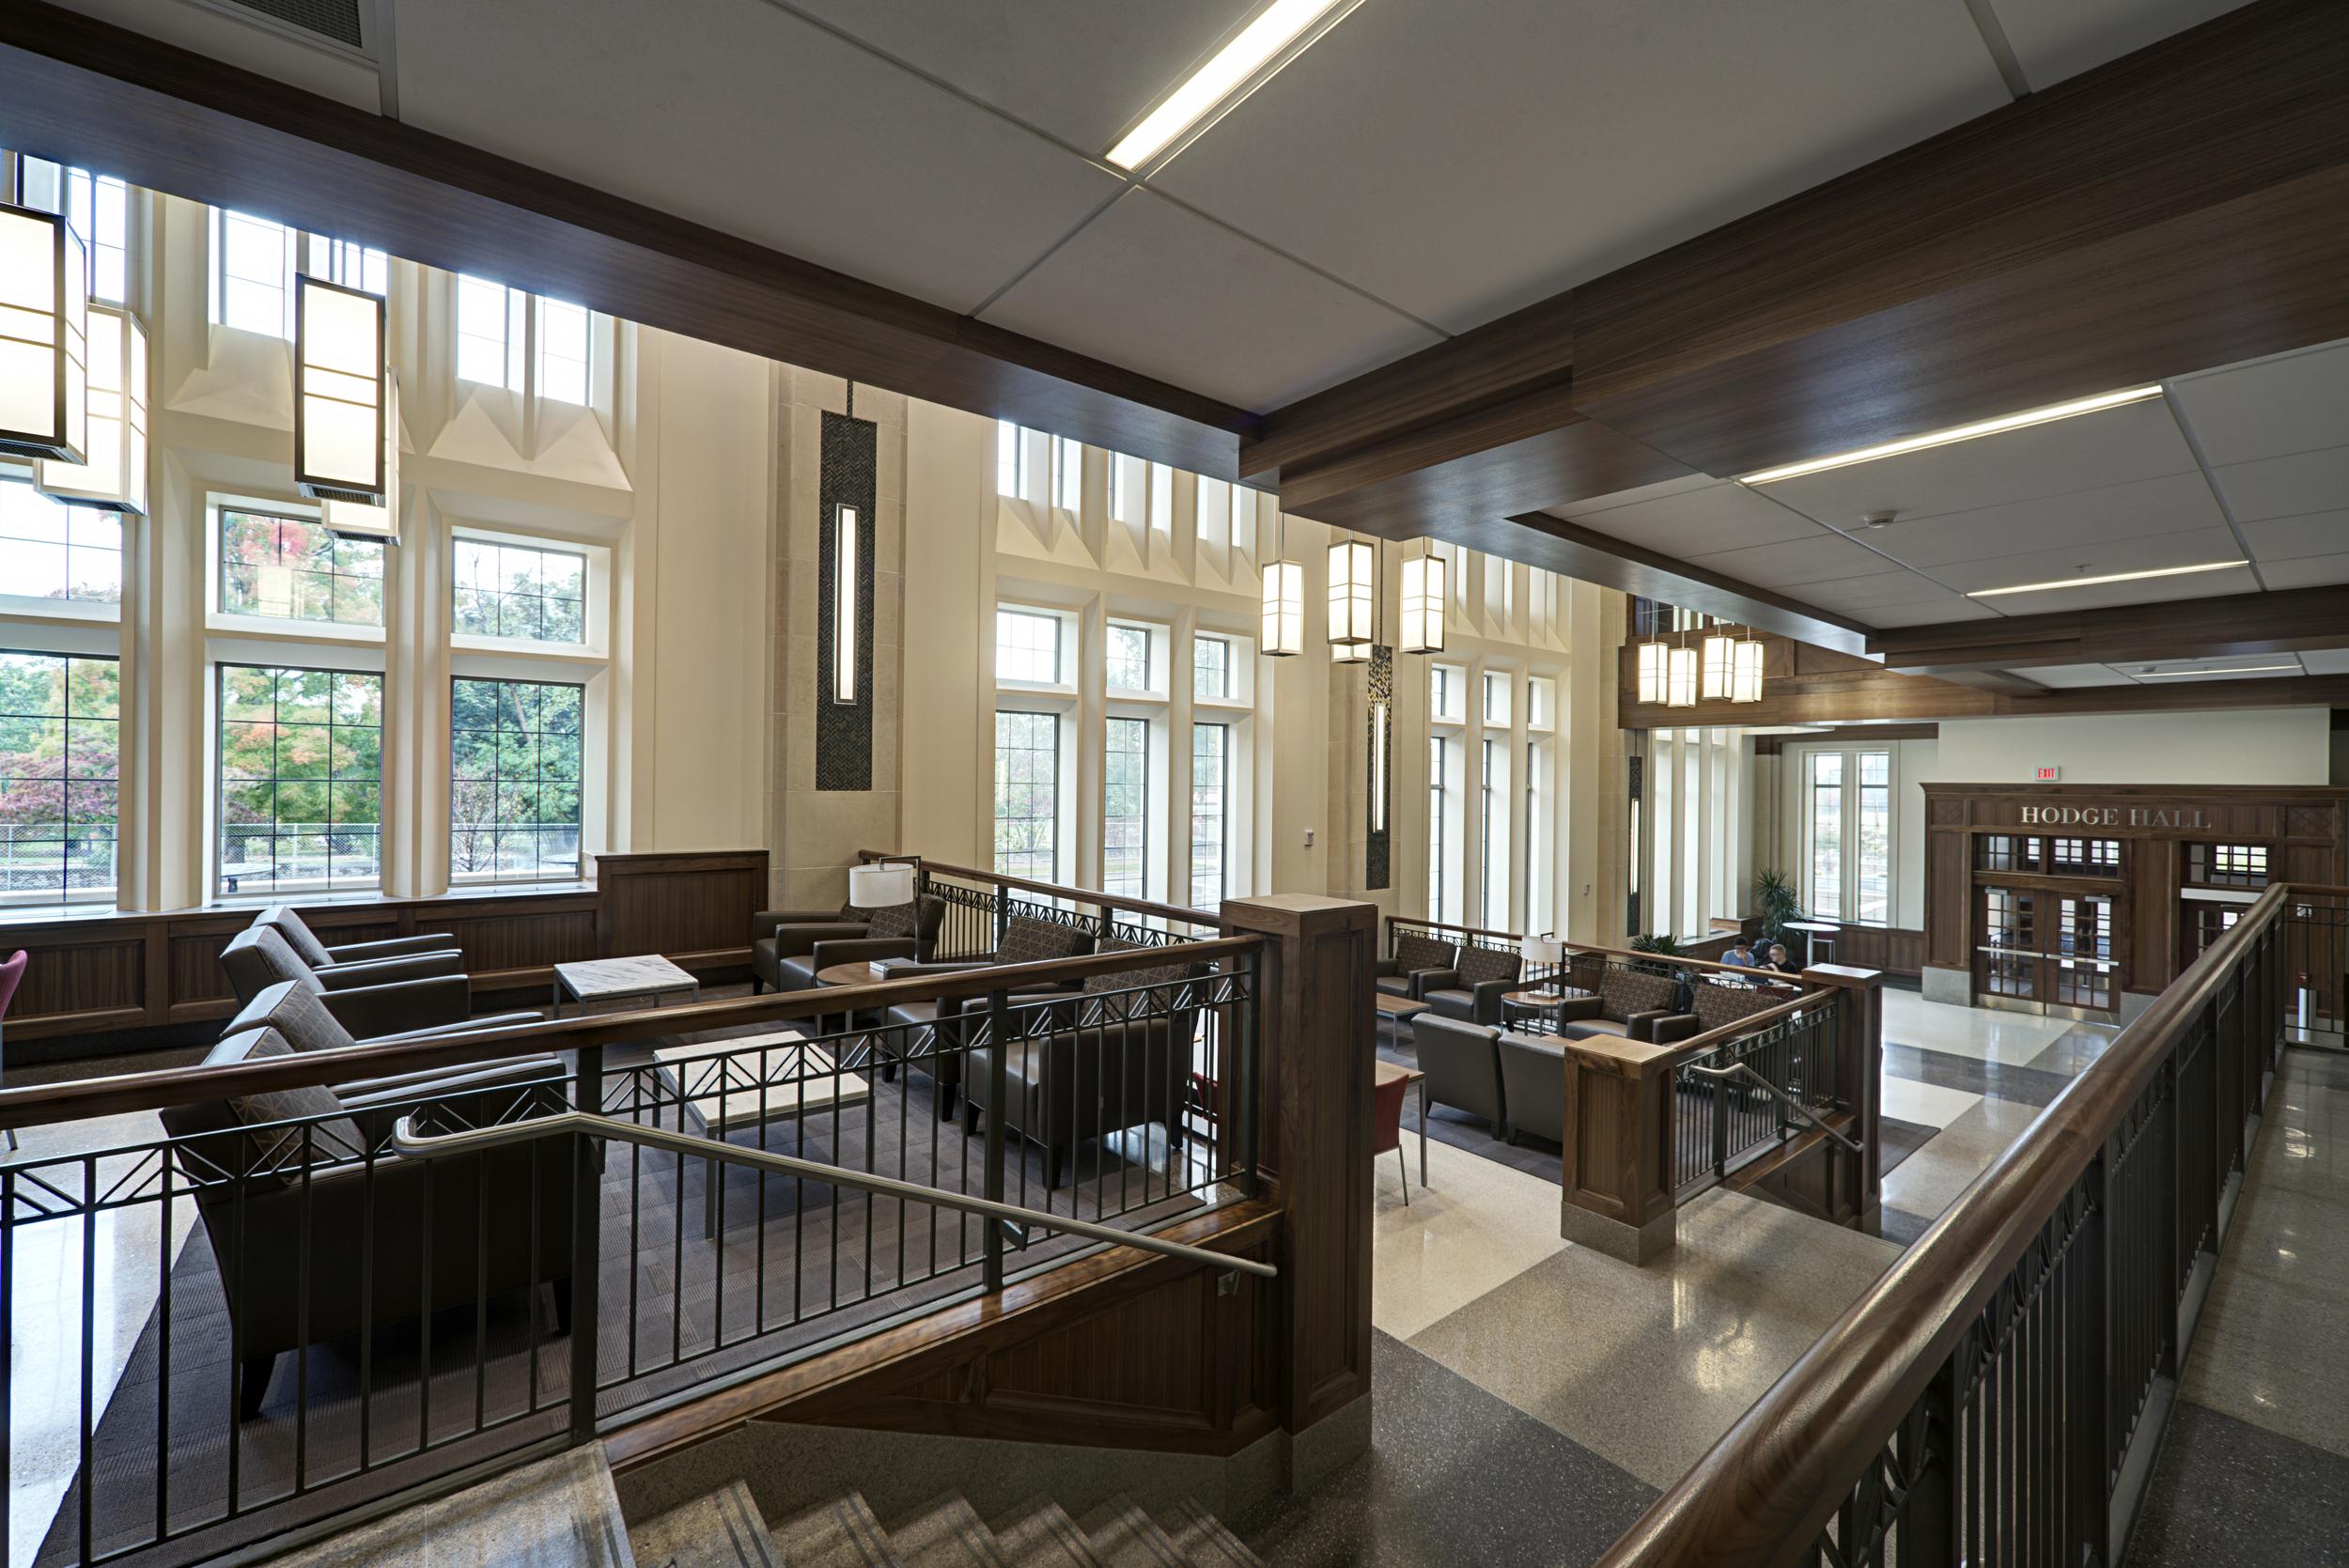 Indiana University - Hodge Hall